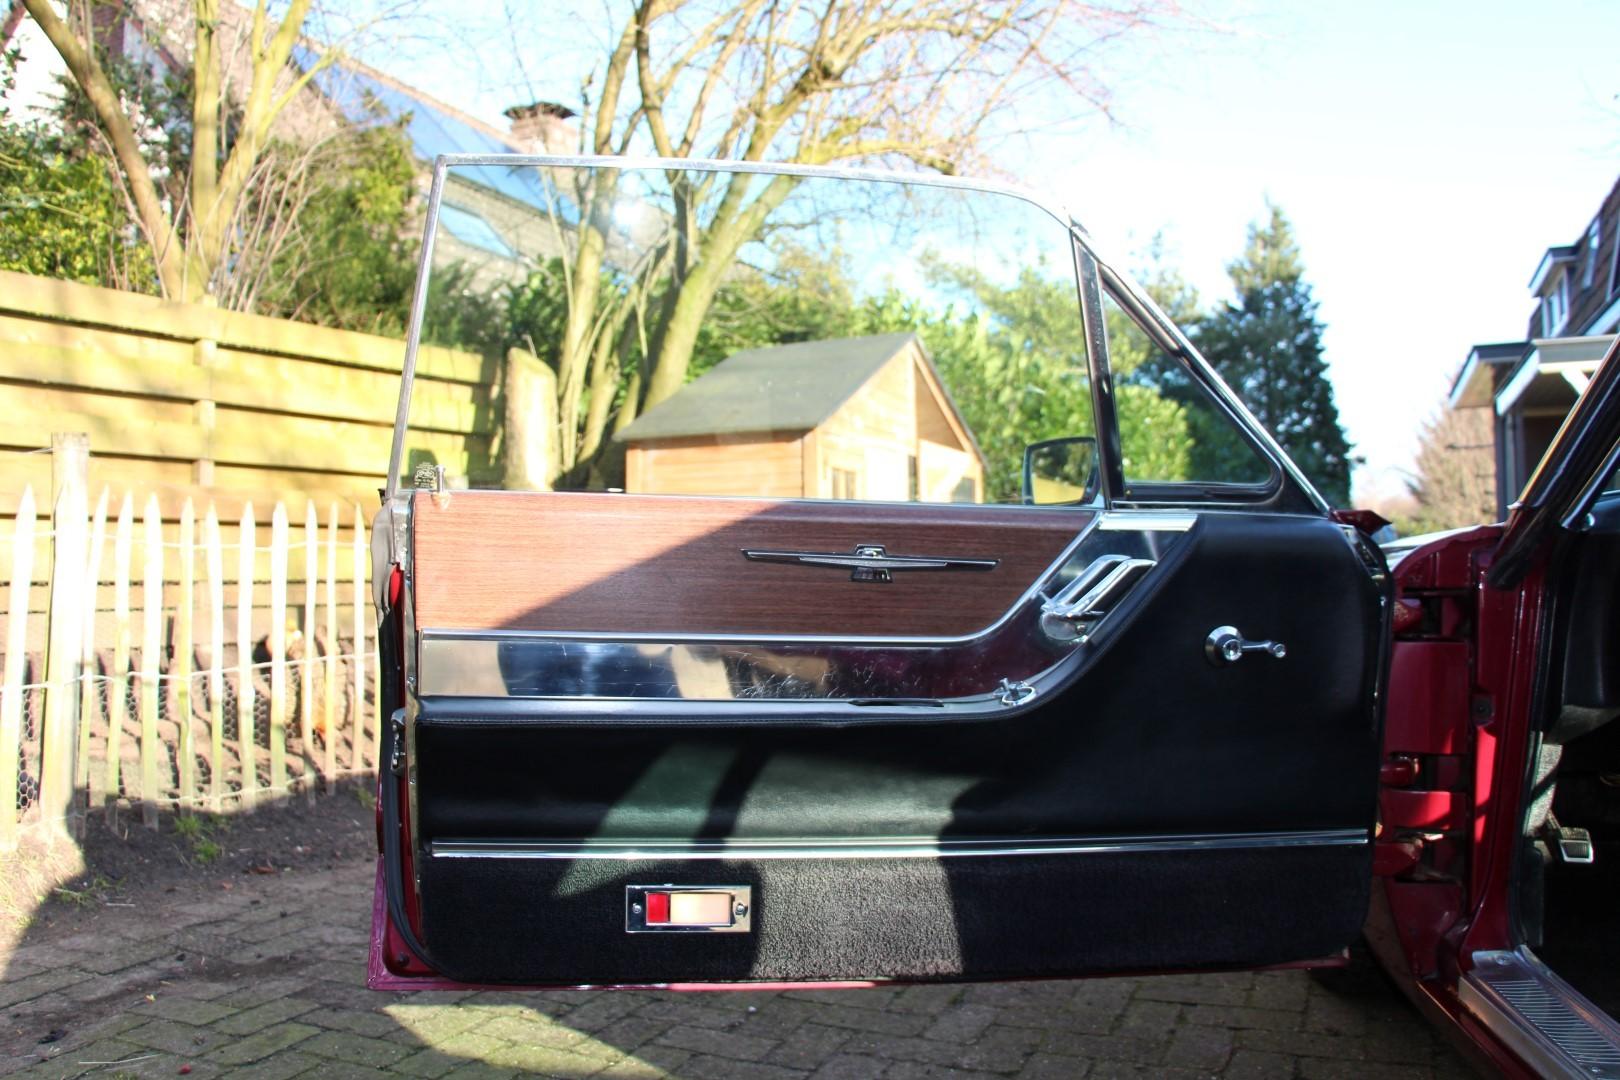 1965 Ford Thunderbird Hardtop - Burgundy (5)